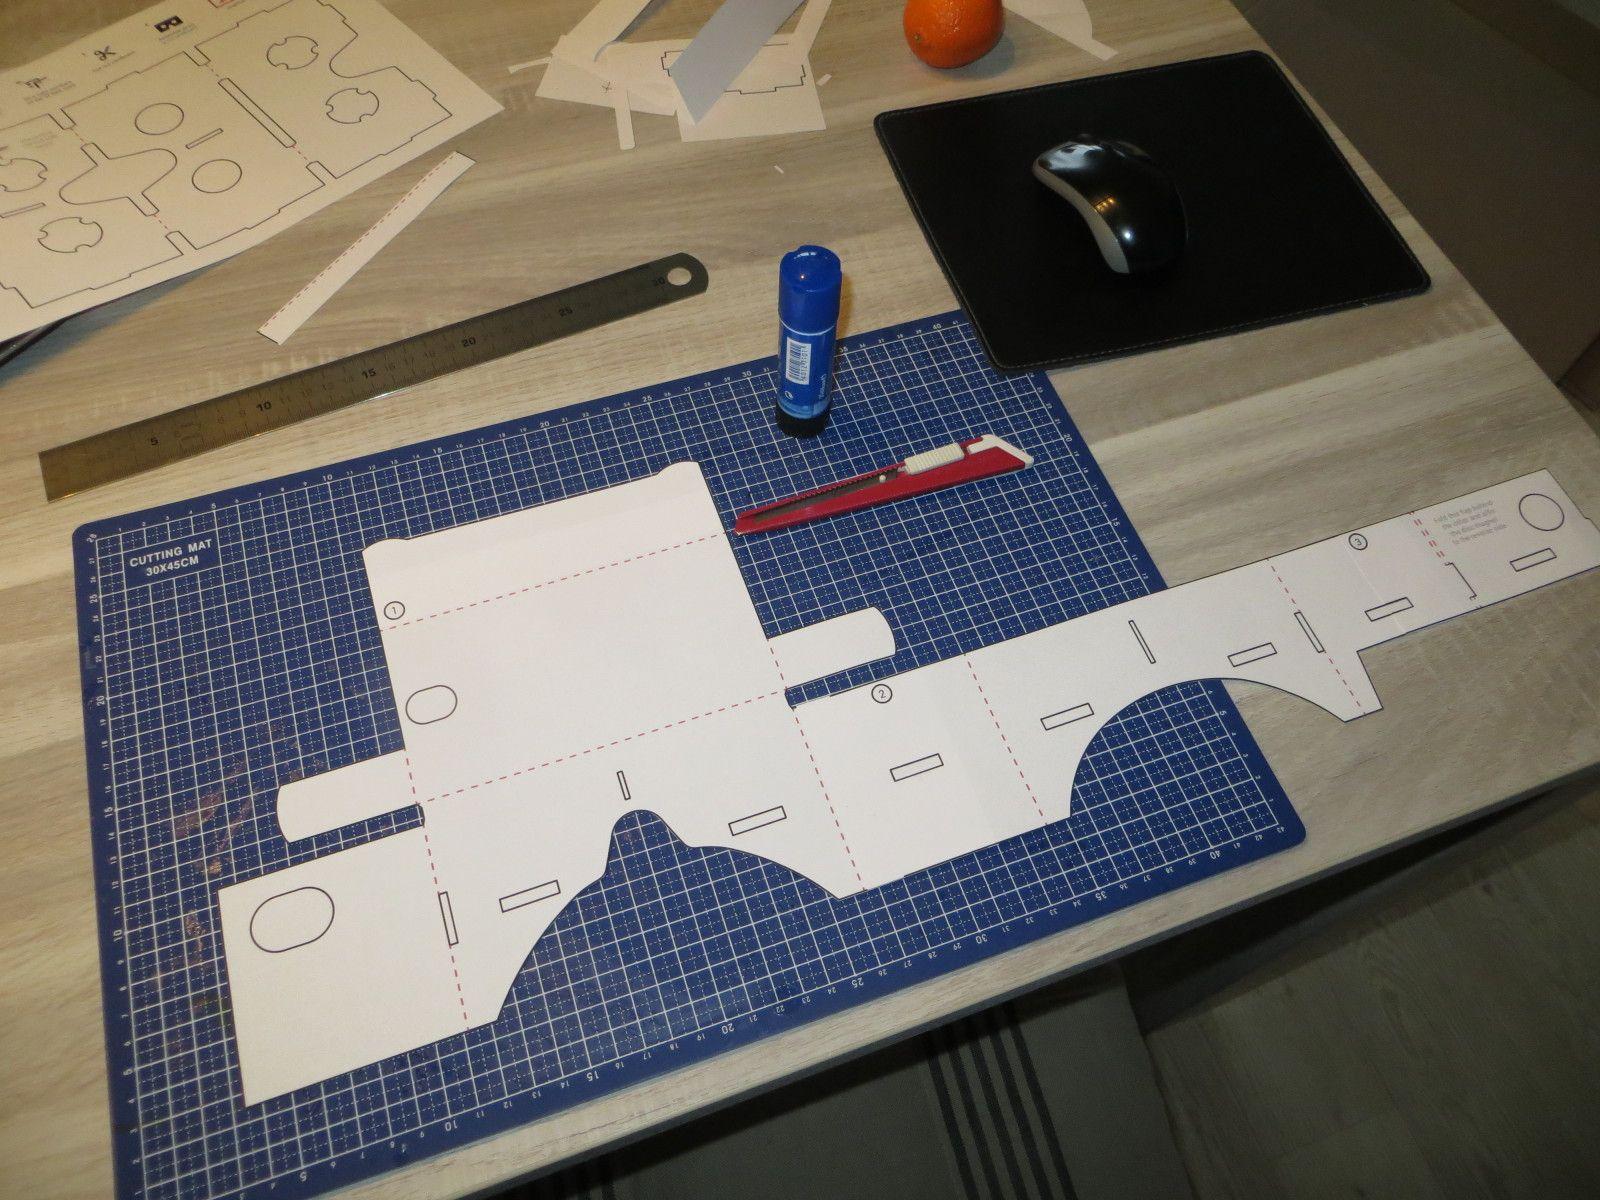 [ IMG] Cardboard vr headset, Computer lab, Vr headset